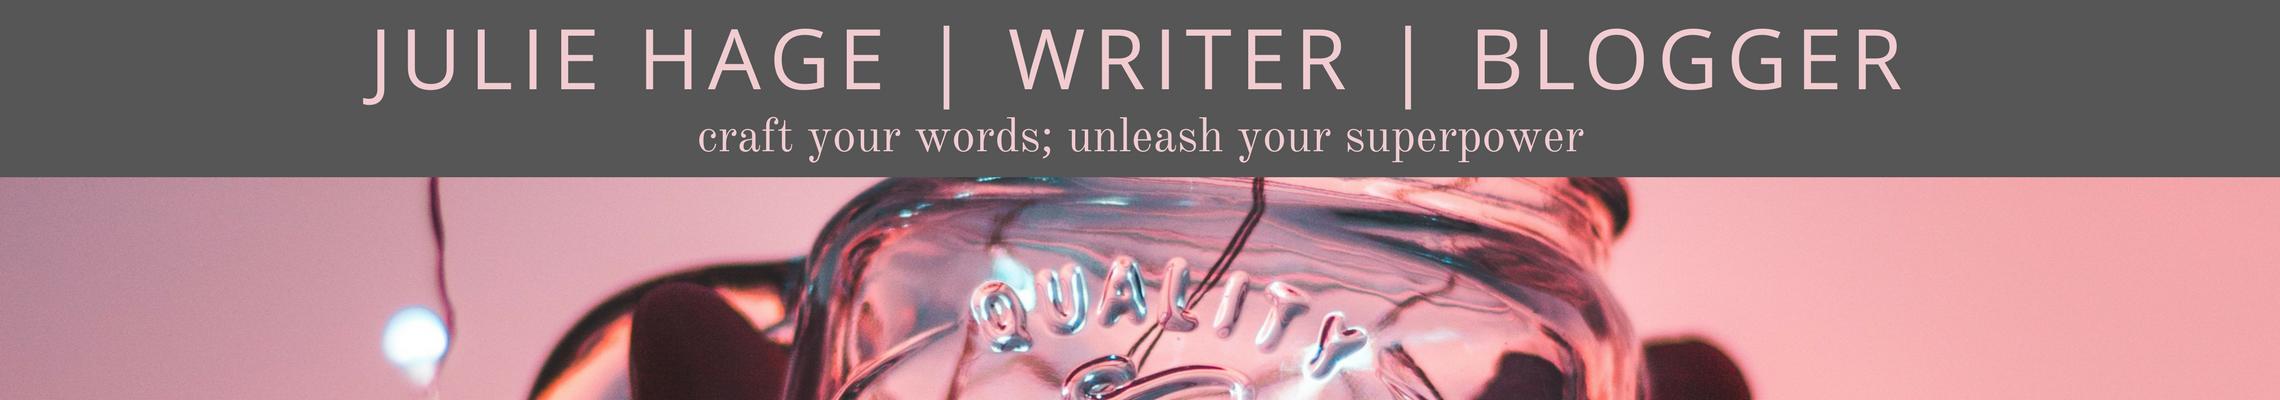 julie hage   writer   blogger   craft your words; unleash your superpower